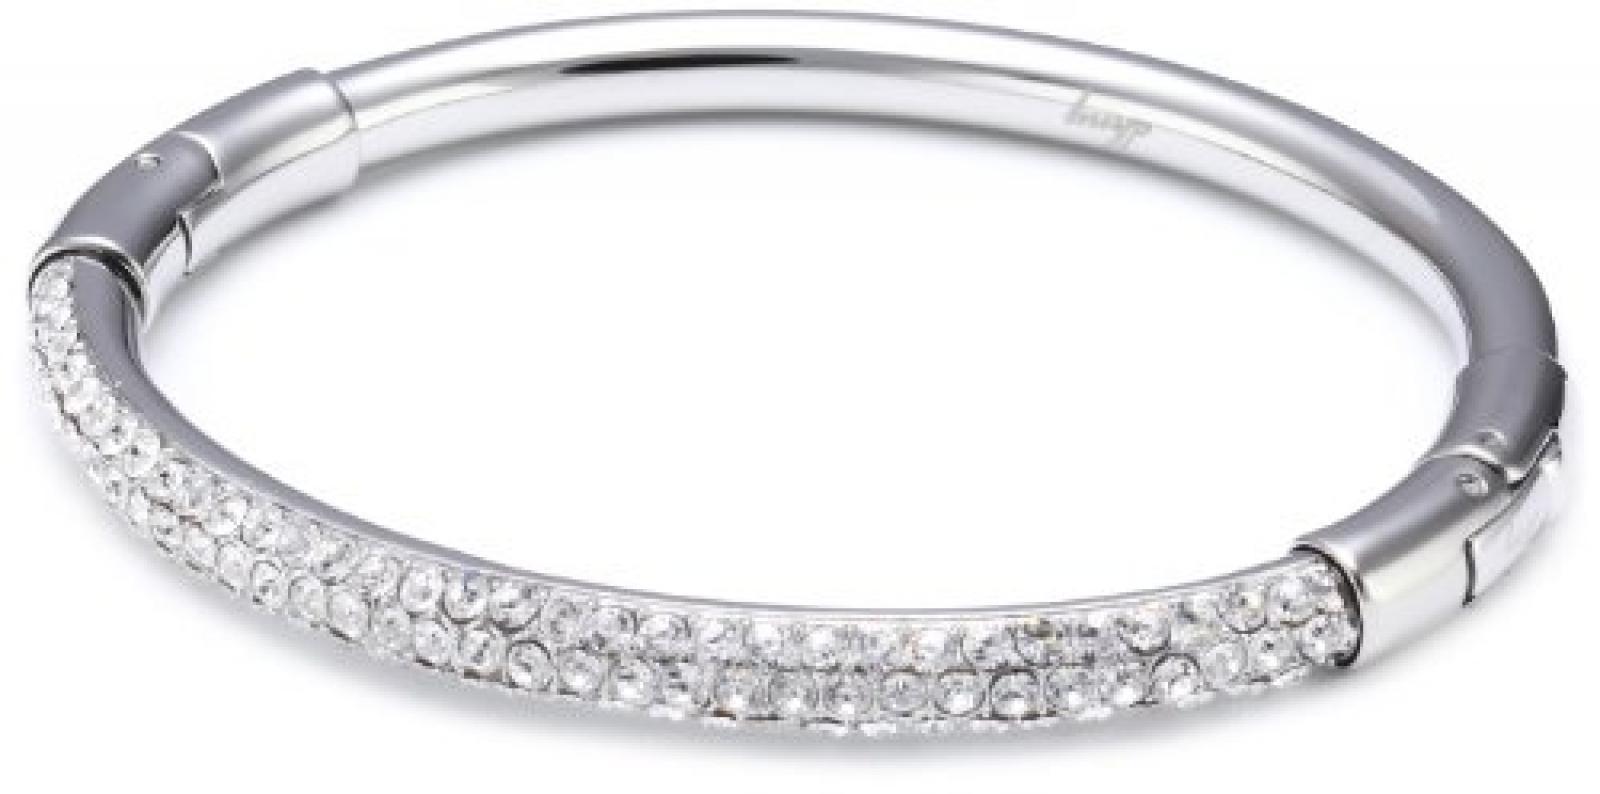 DKNY Damen-Armband Spring 2013 Edelstahl Silber Zirkonia NJ1955040